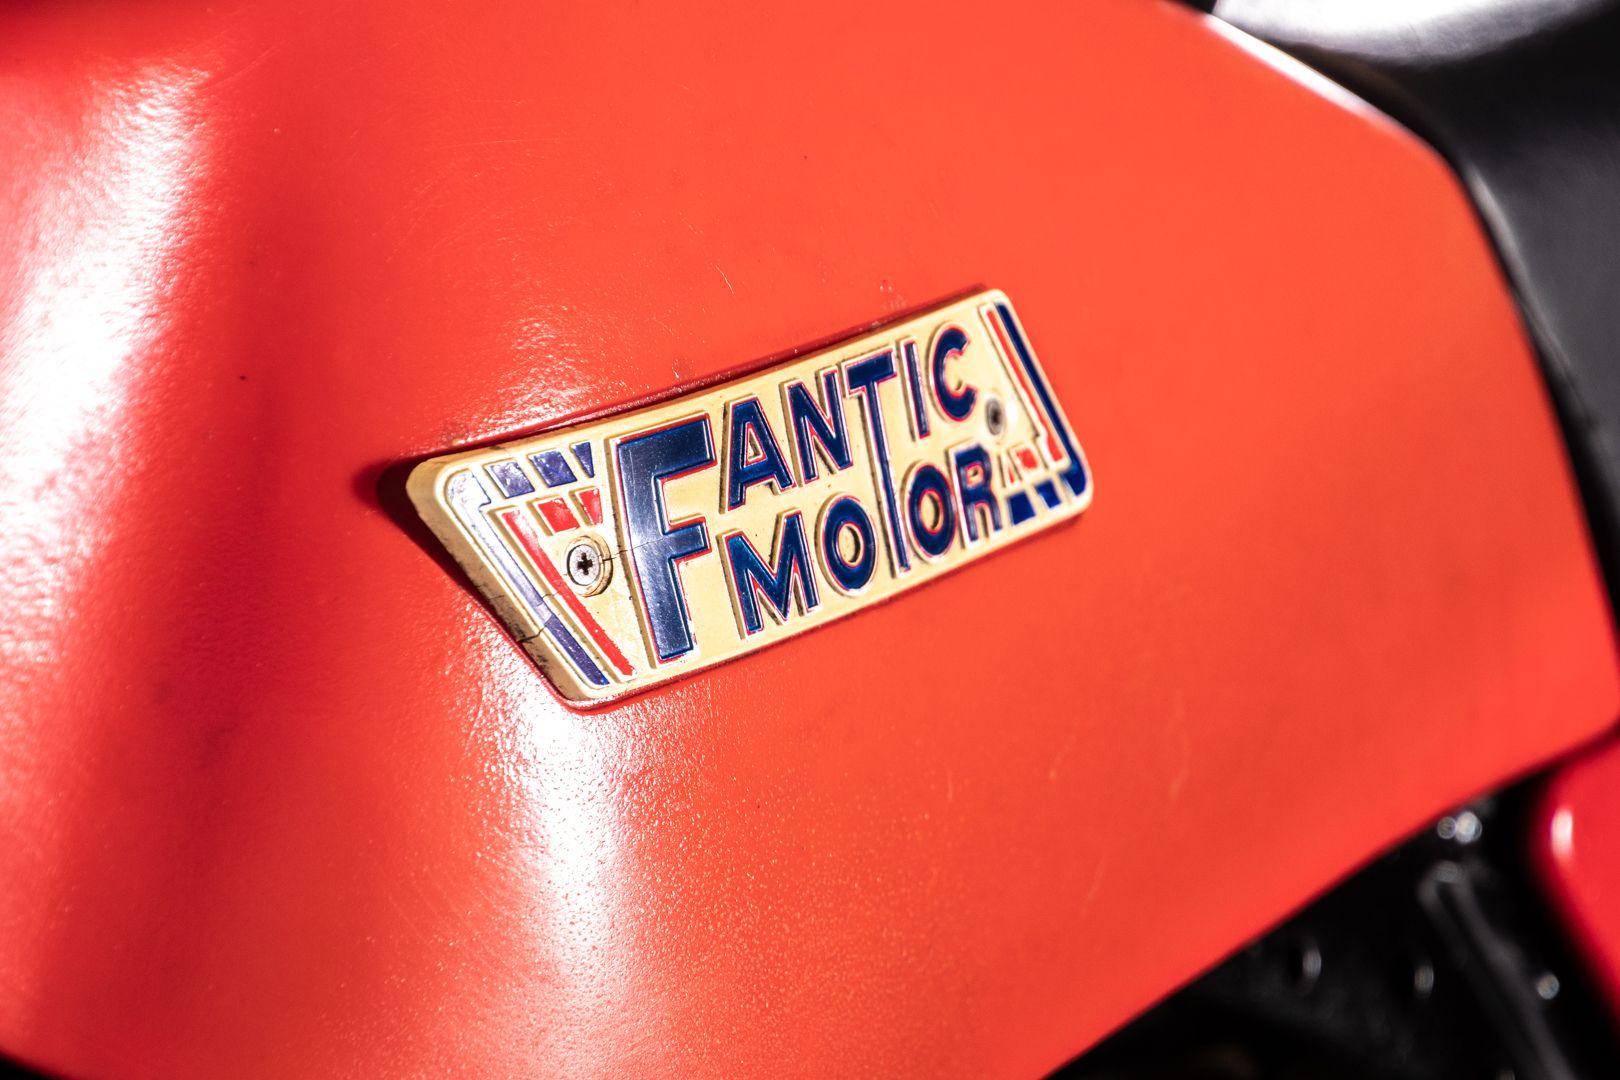 1984 Fantic Motor 402 48175